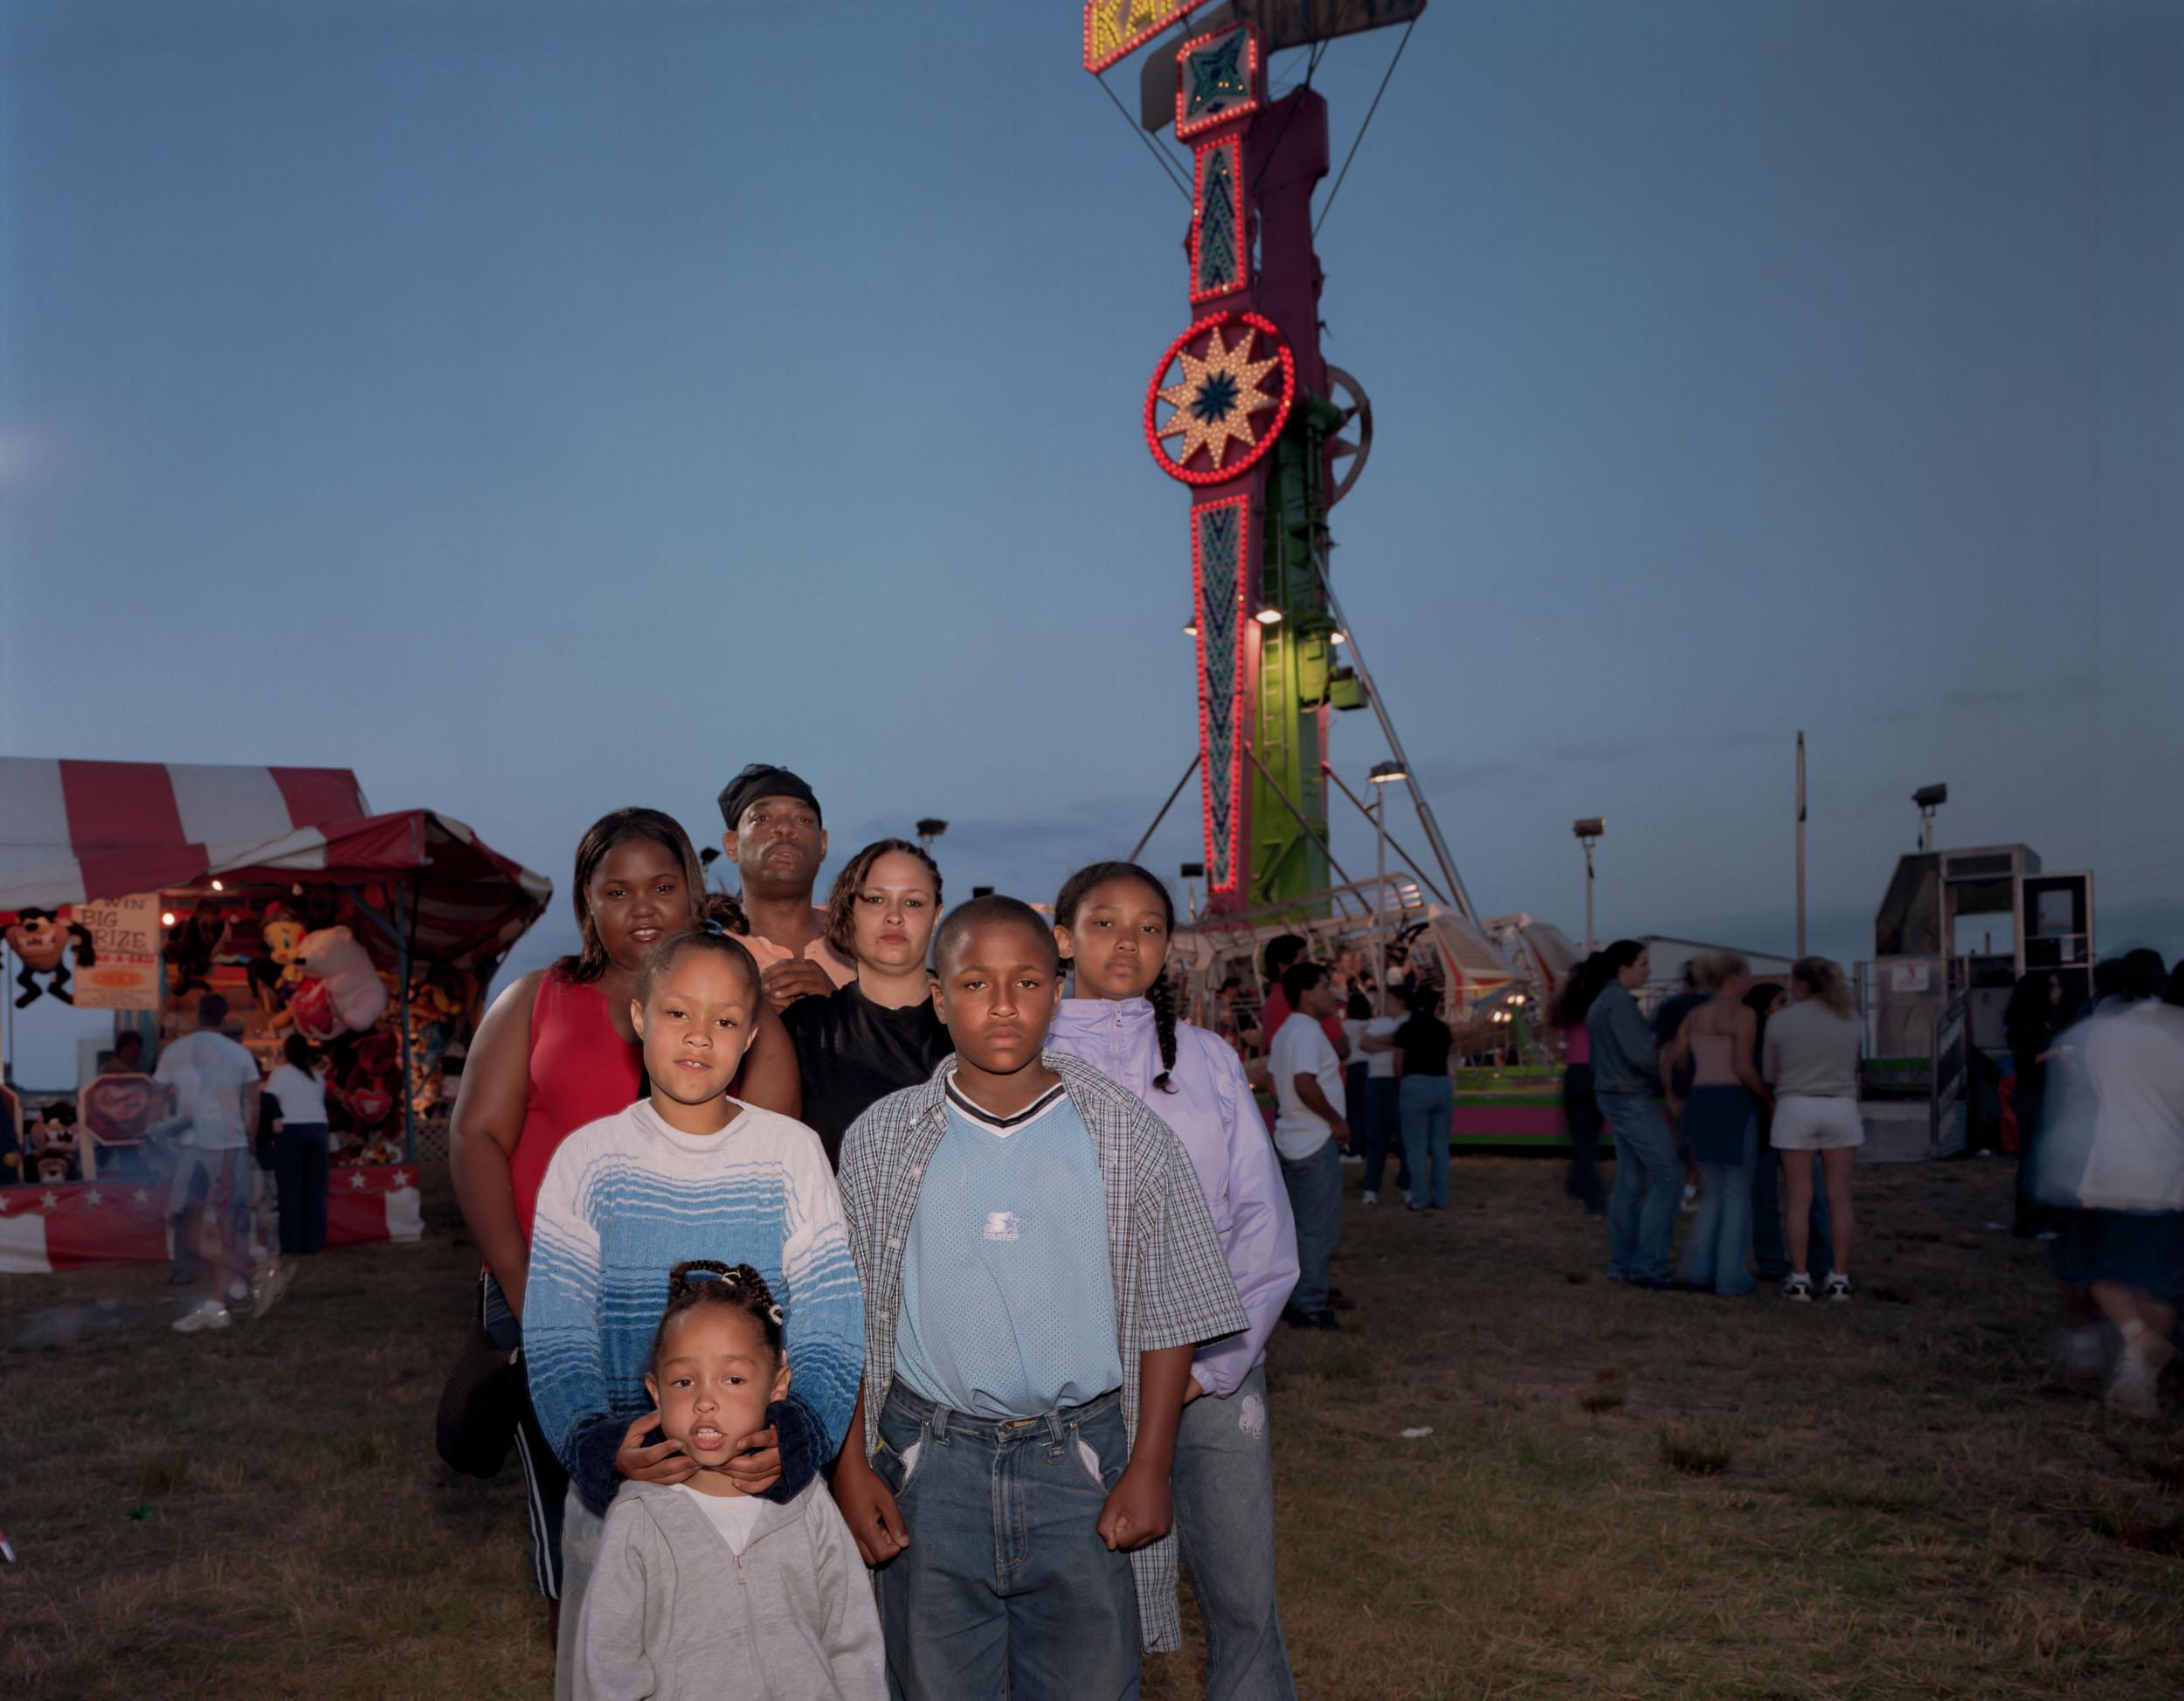 Carnival _Family_001.1.jpg